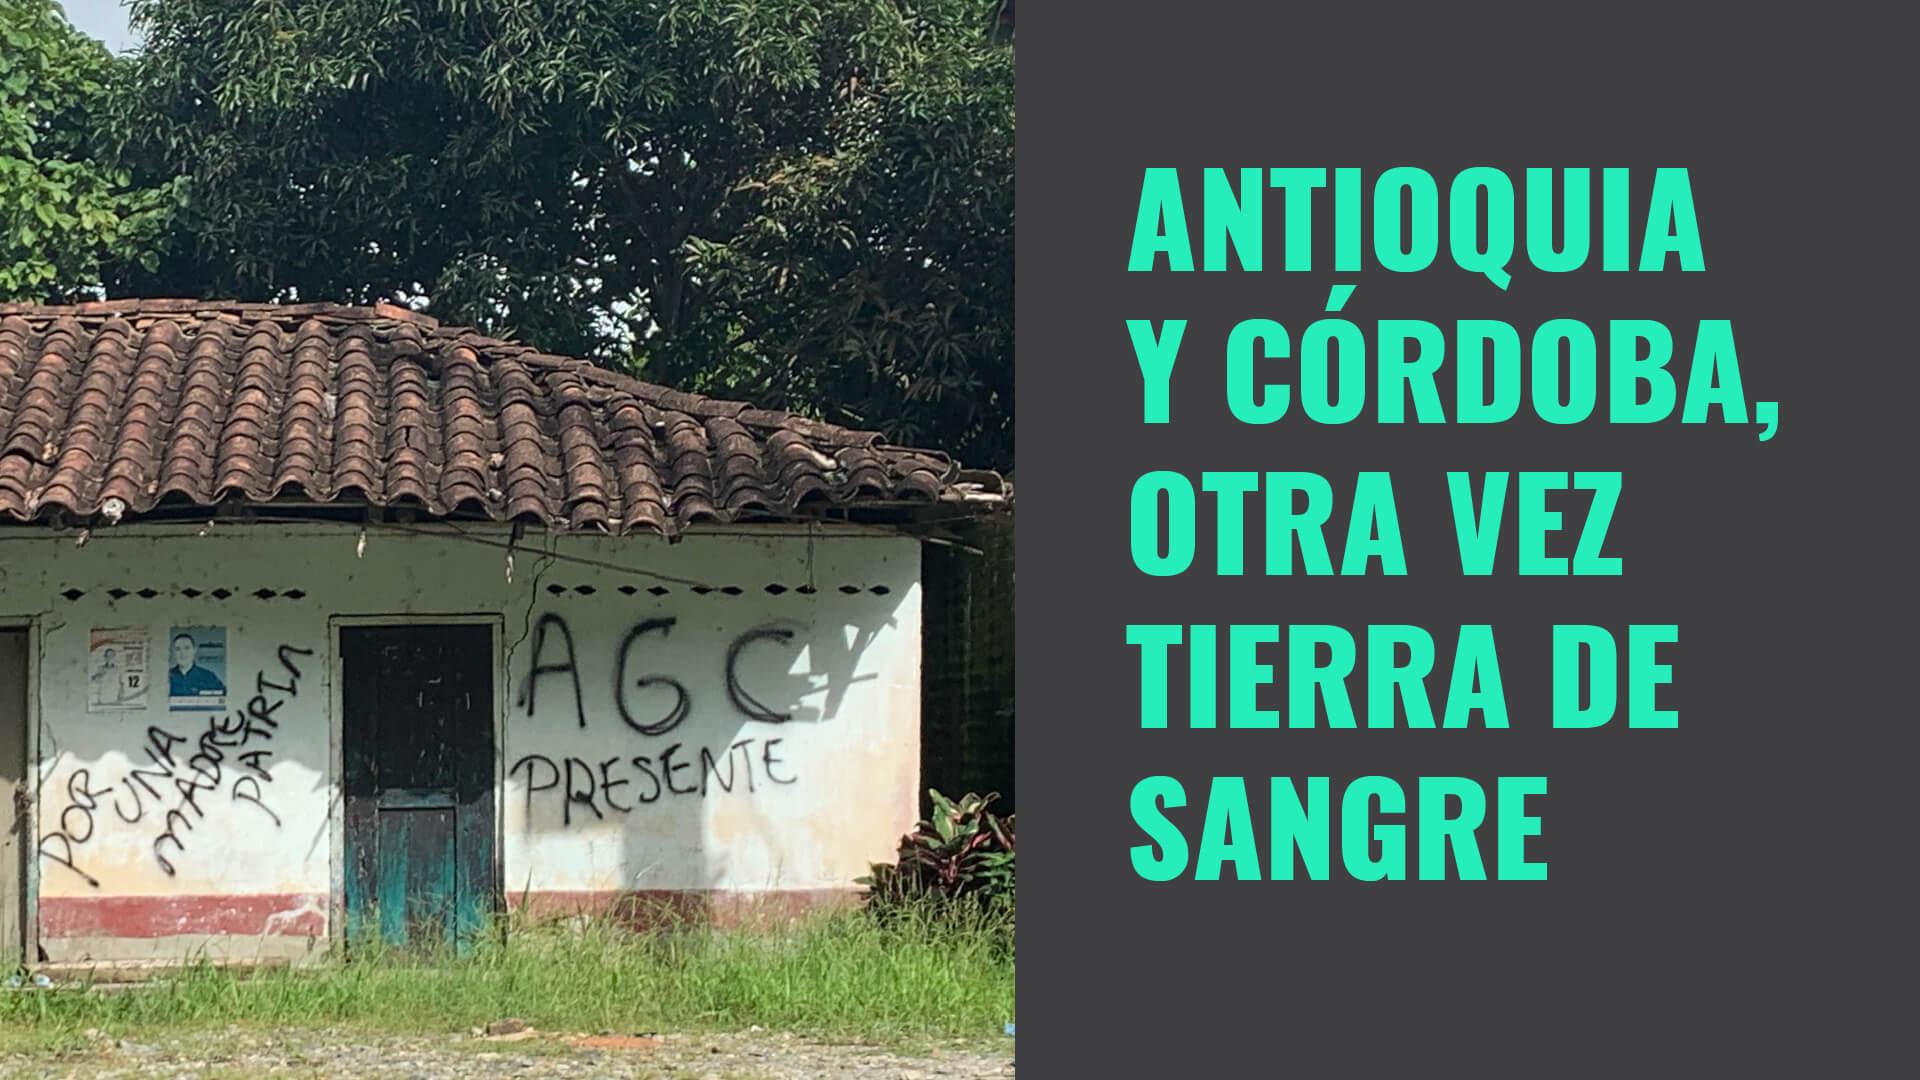 Antioquia y Córdoba, otra vez tierra de sangre